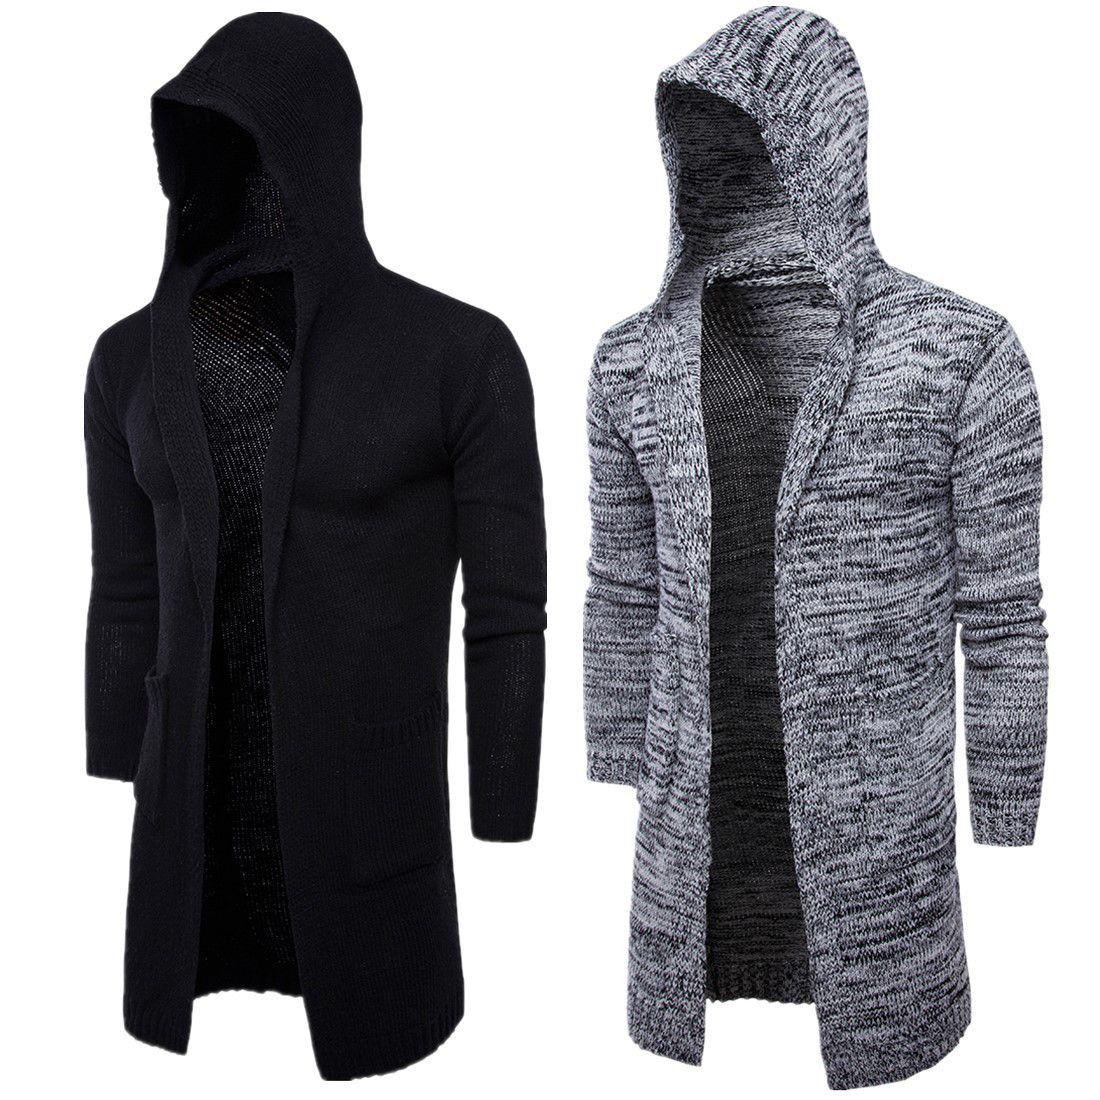 Men's Hooded Sweater Knitting Cardigan Sweater Jackets Slim Long ...